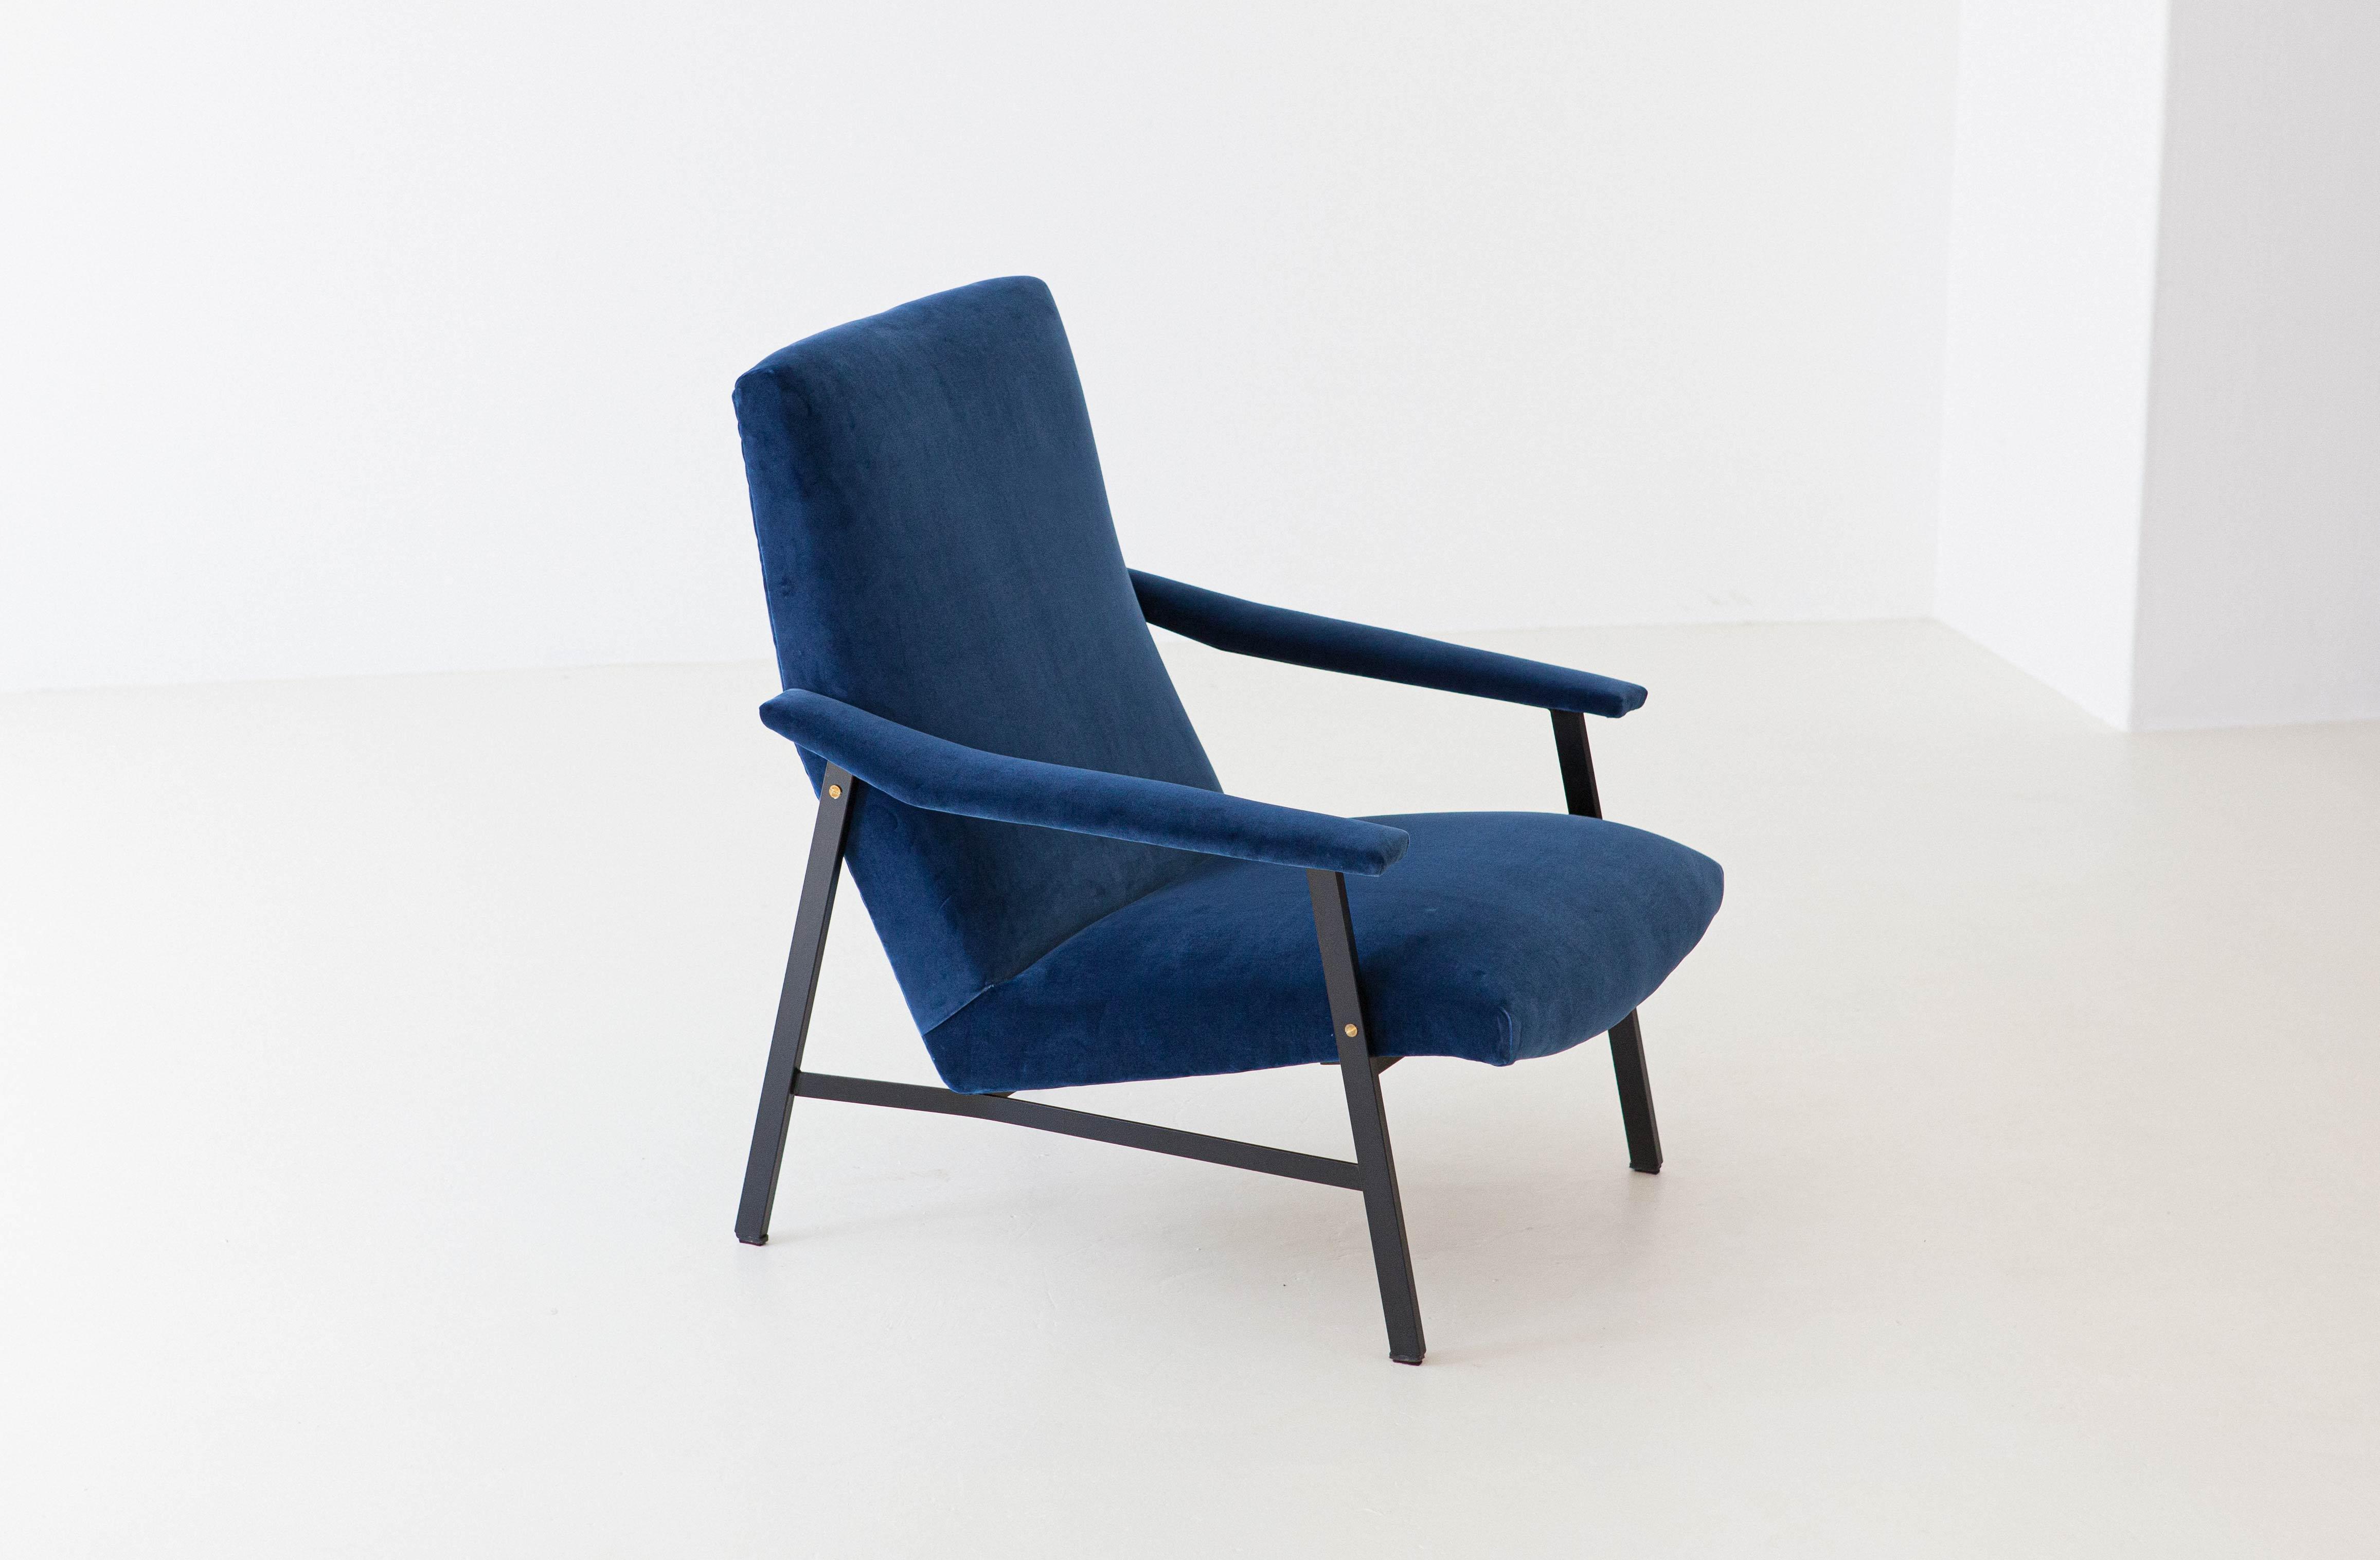 1950s-Italian-blu-velvet-lounge-armchair-3-SE295